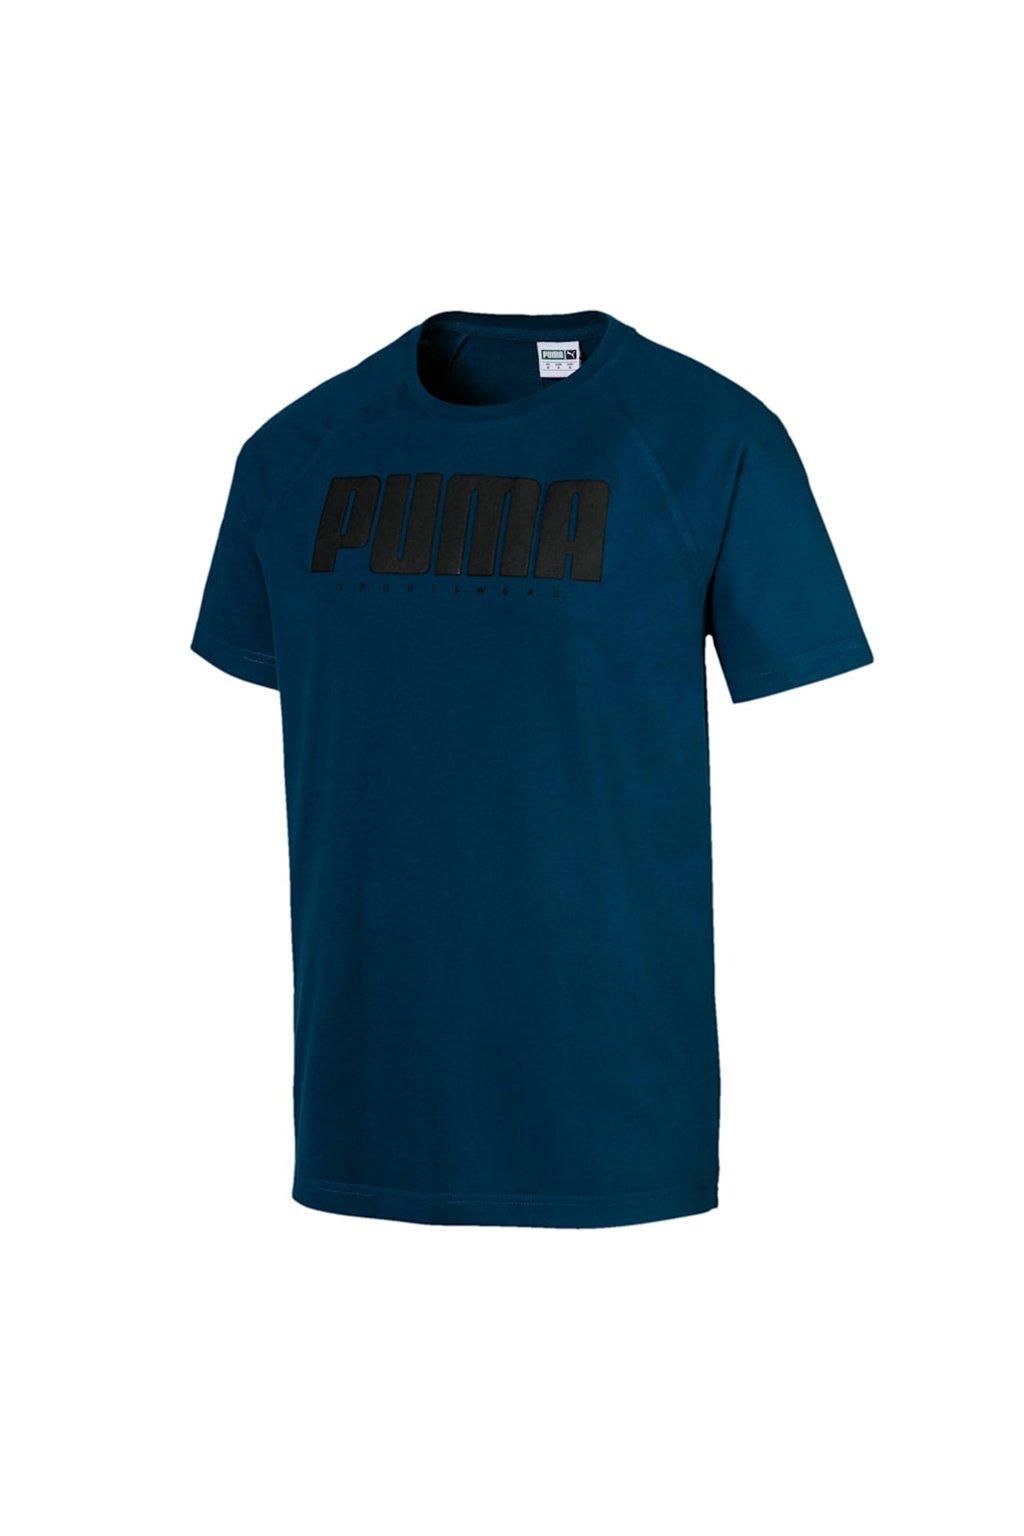 Pánske tričko Puma Athletics Tee modré 580134 38